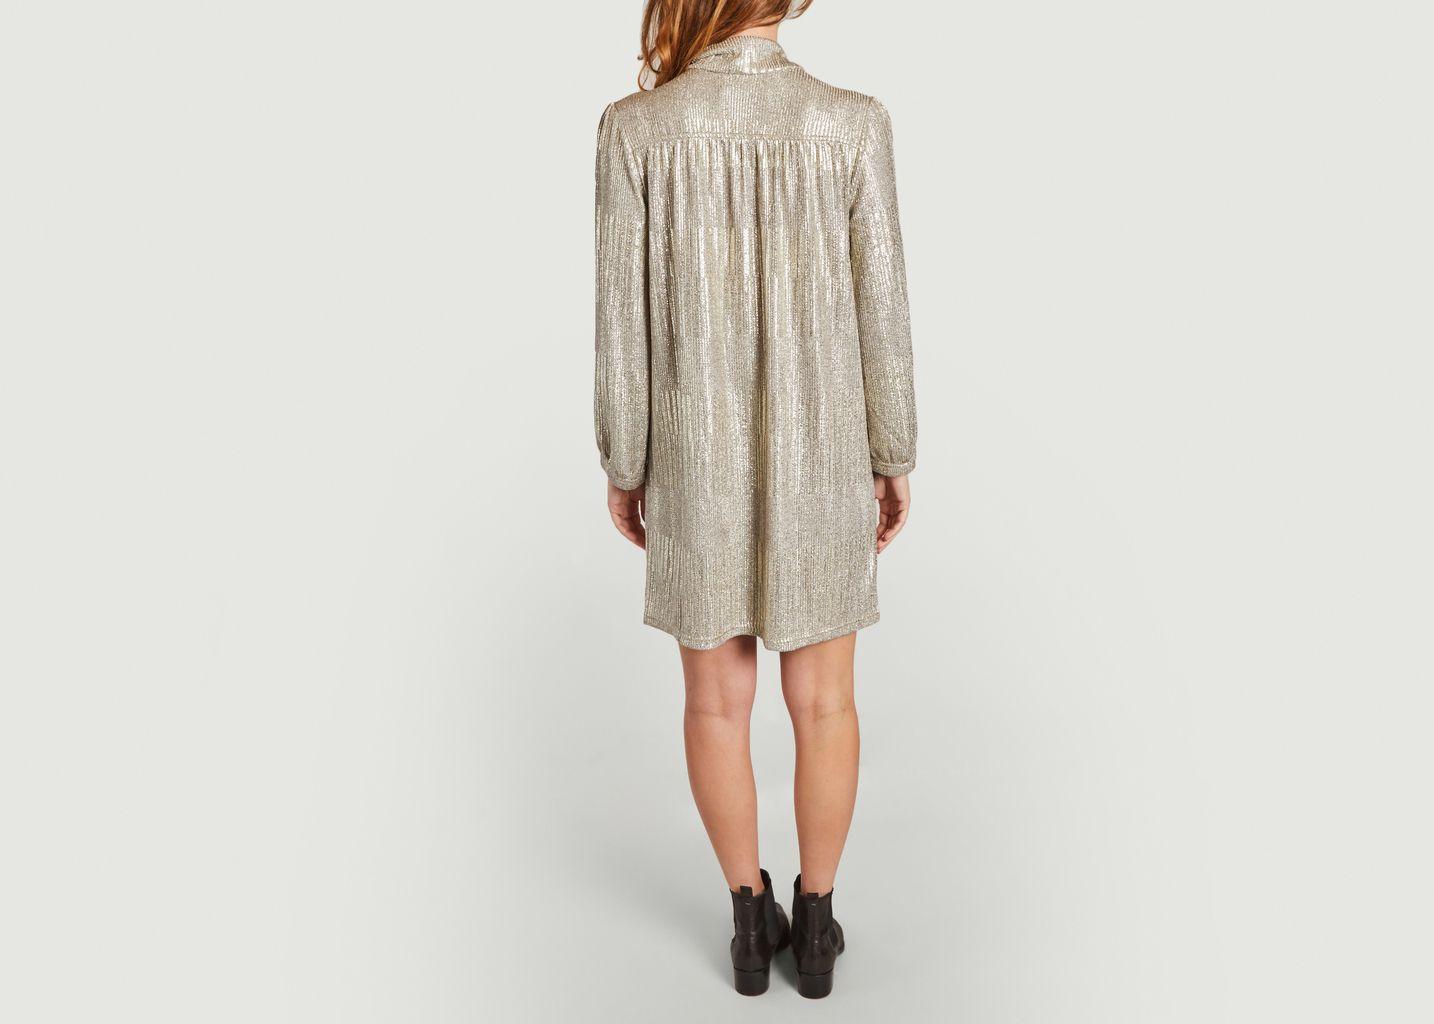 Robe nouée - See by Chloé